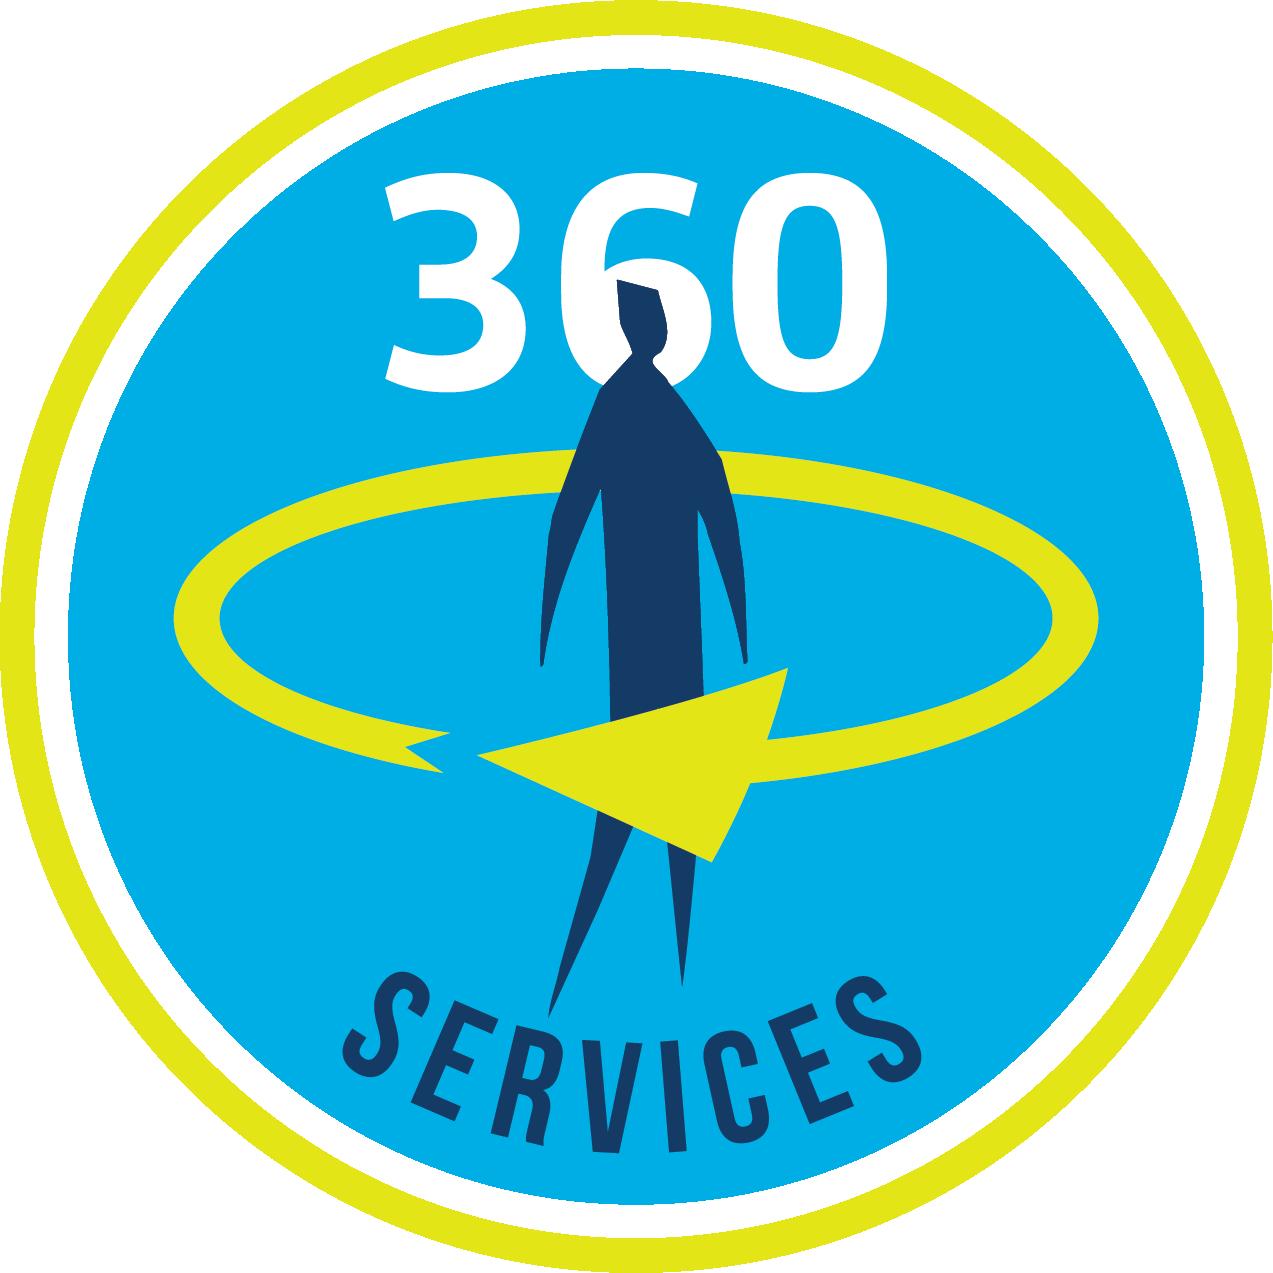 aclvb-universele_diensten-logo-cmyk_ok_fr_9.png